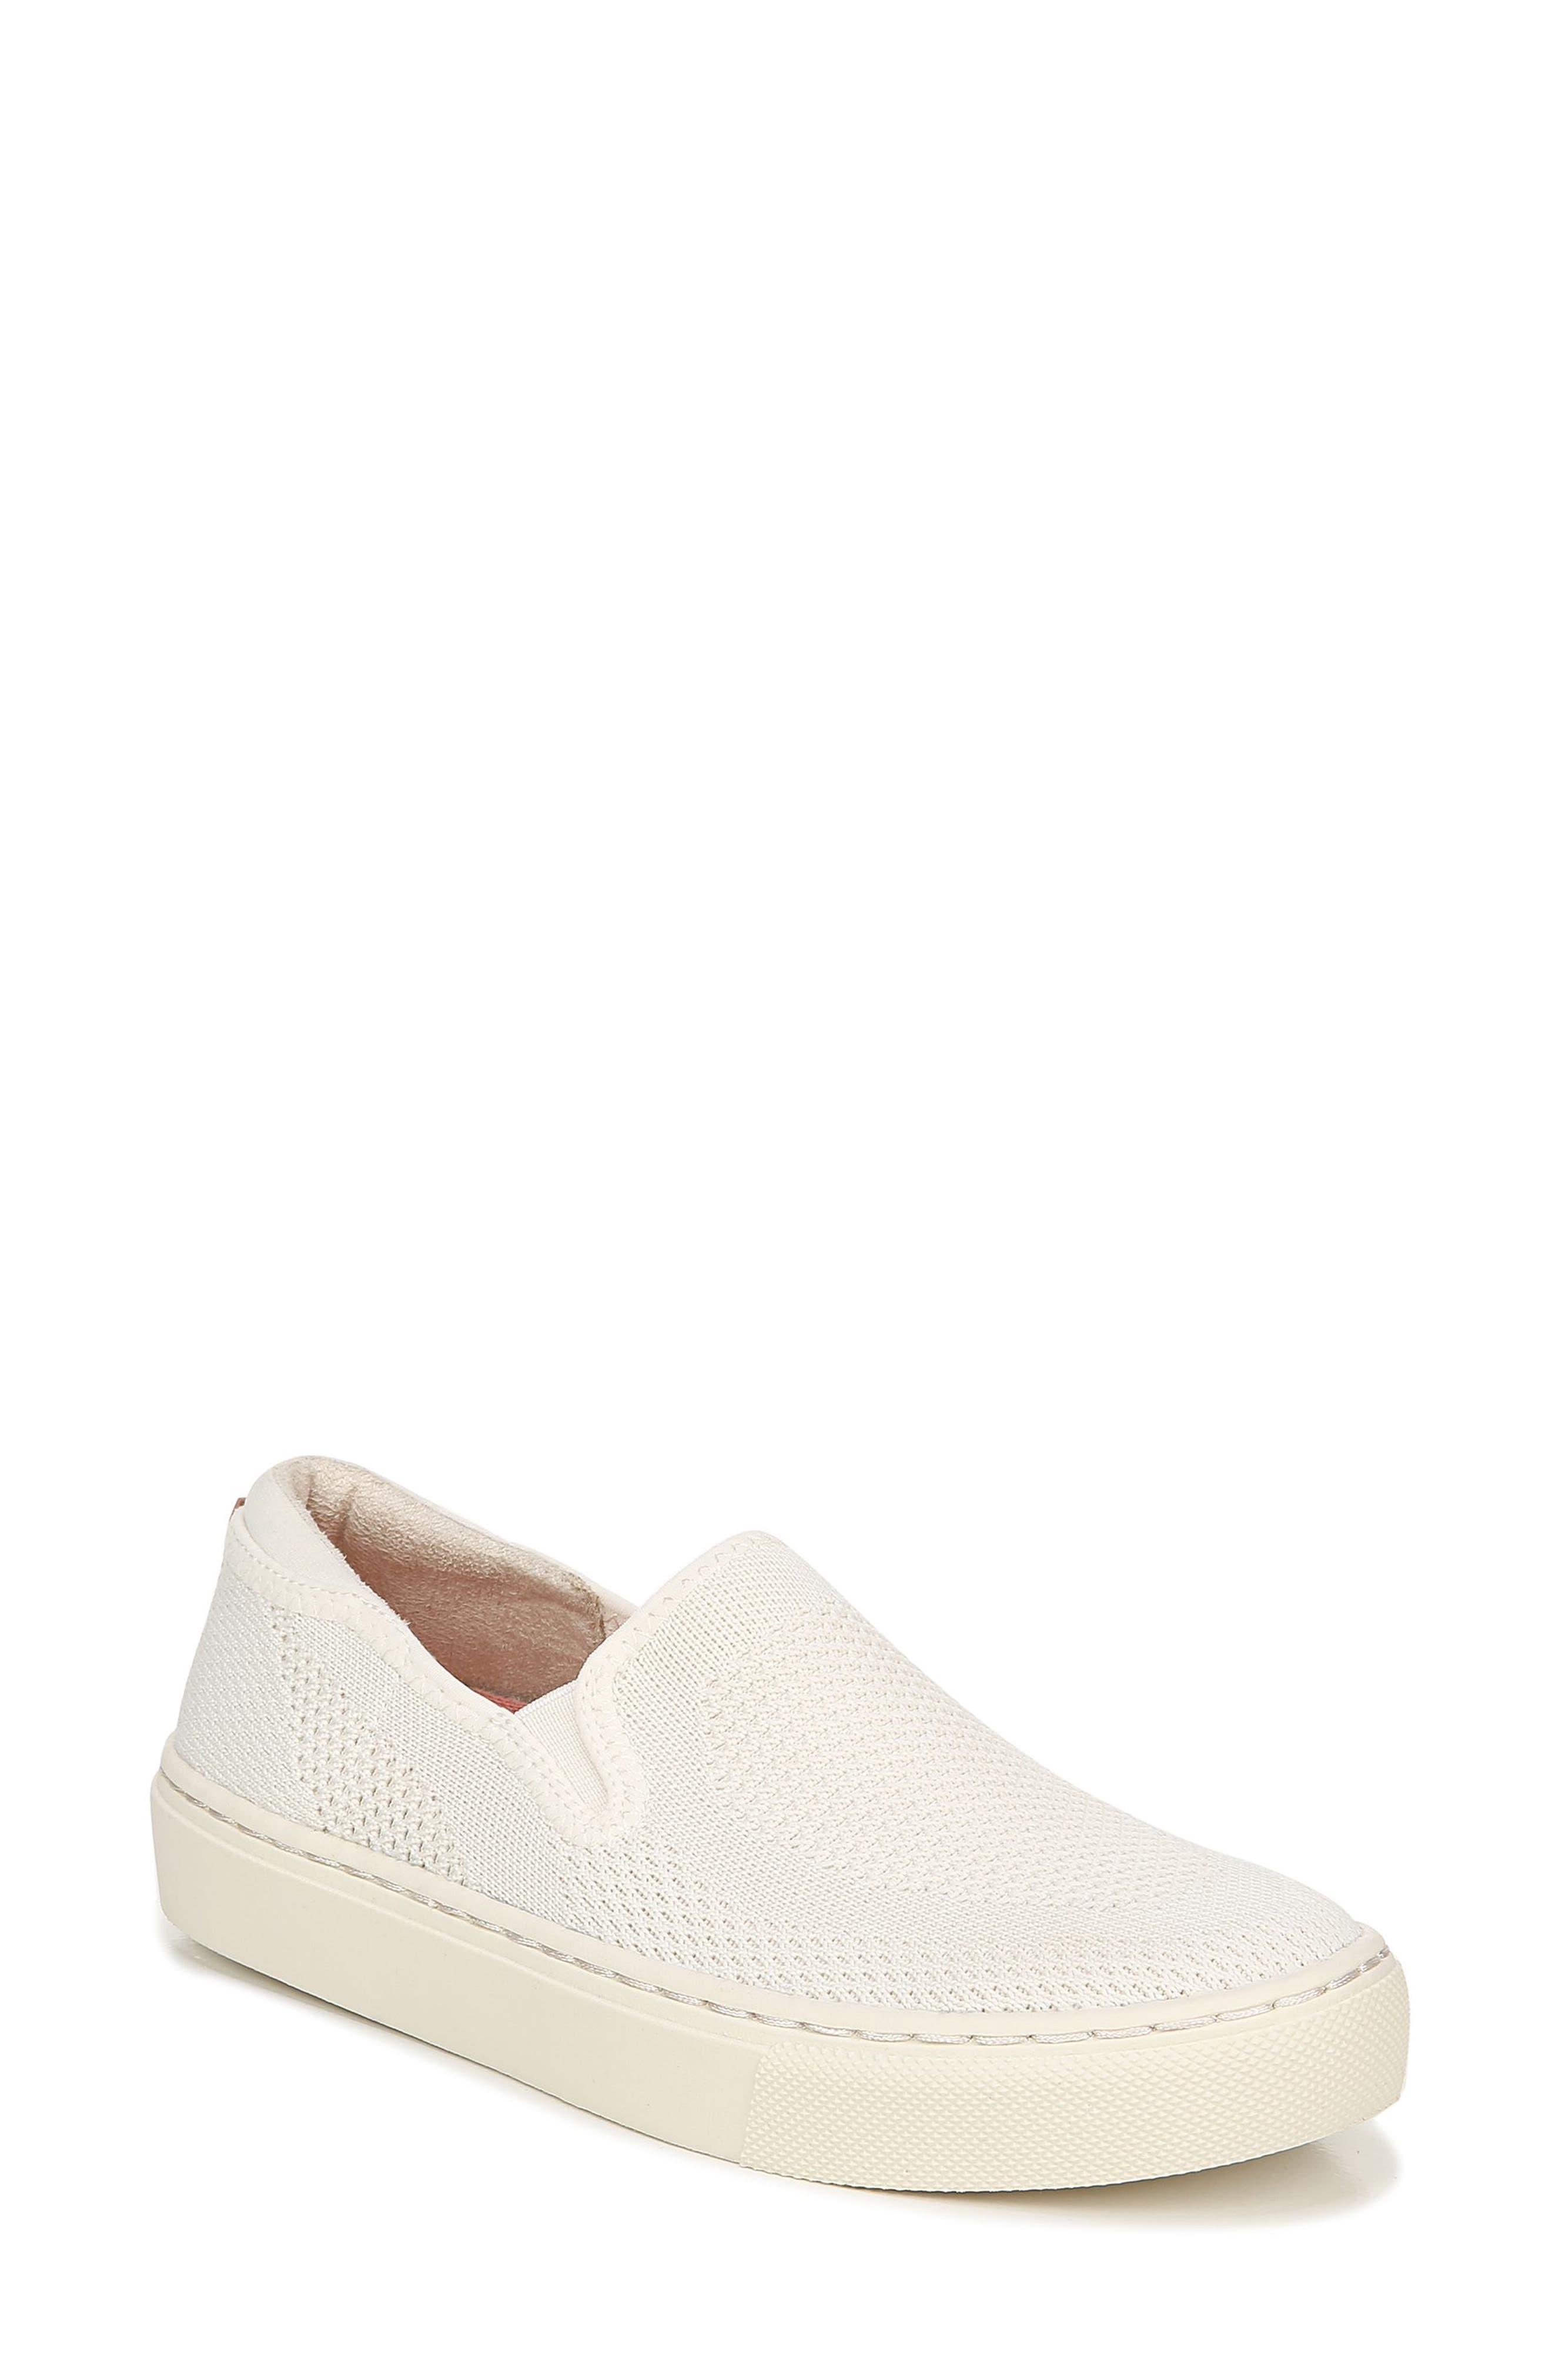 No Chill Knit Slip-On Sneaker